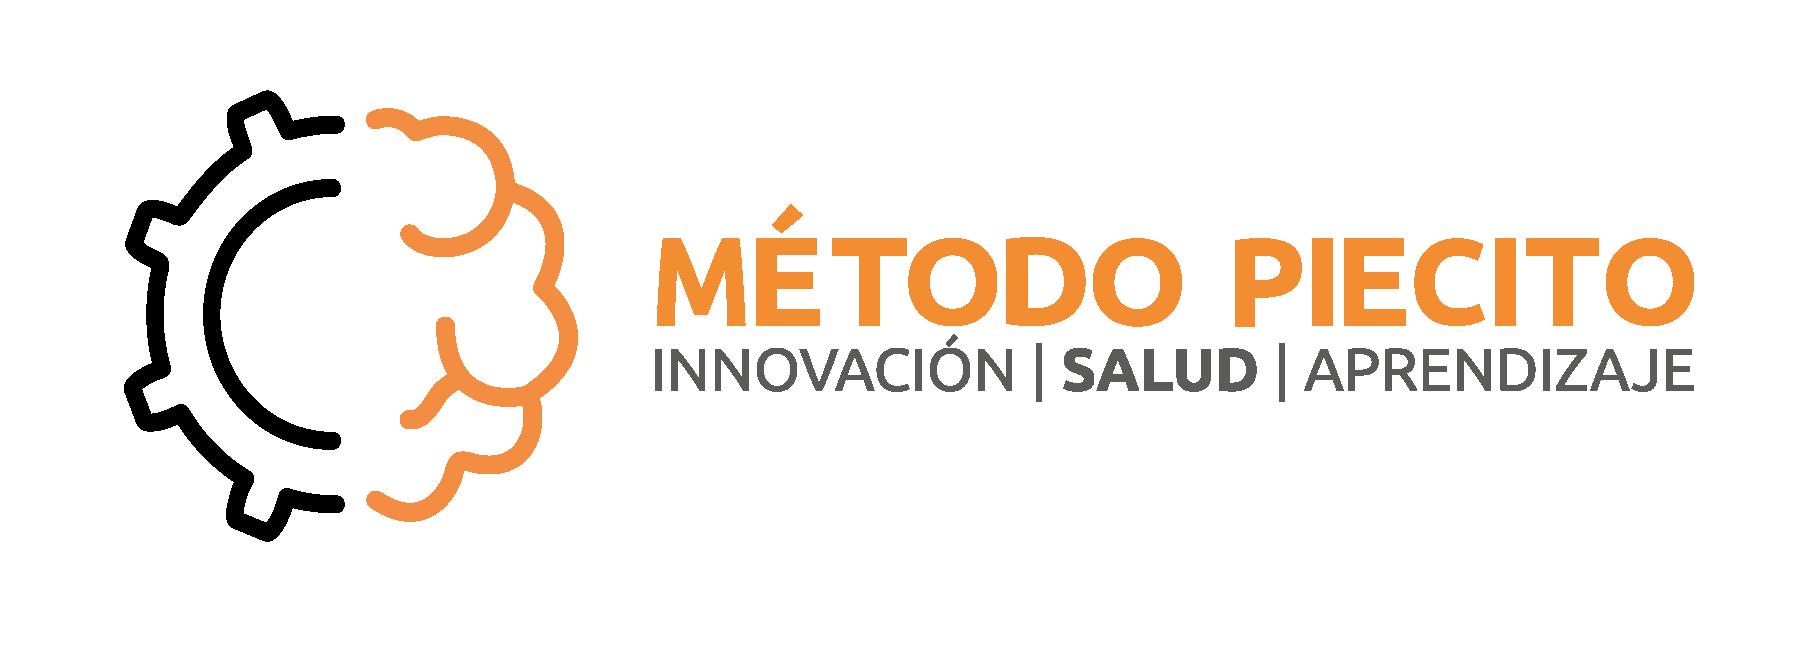 Metodo Piecito